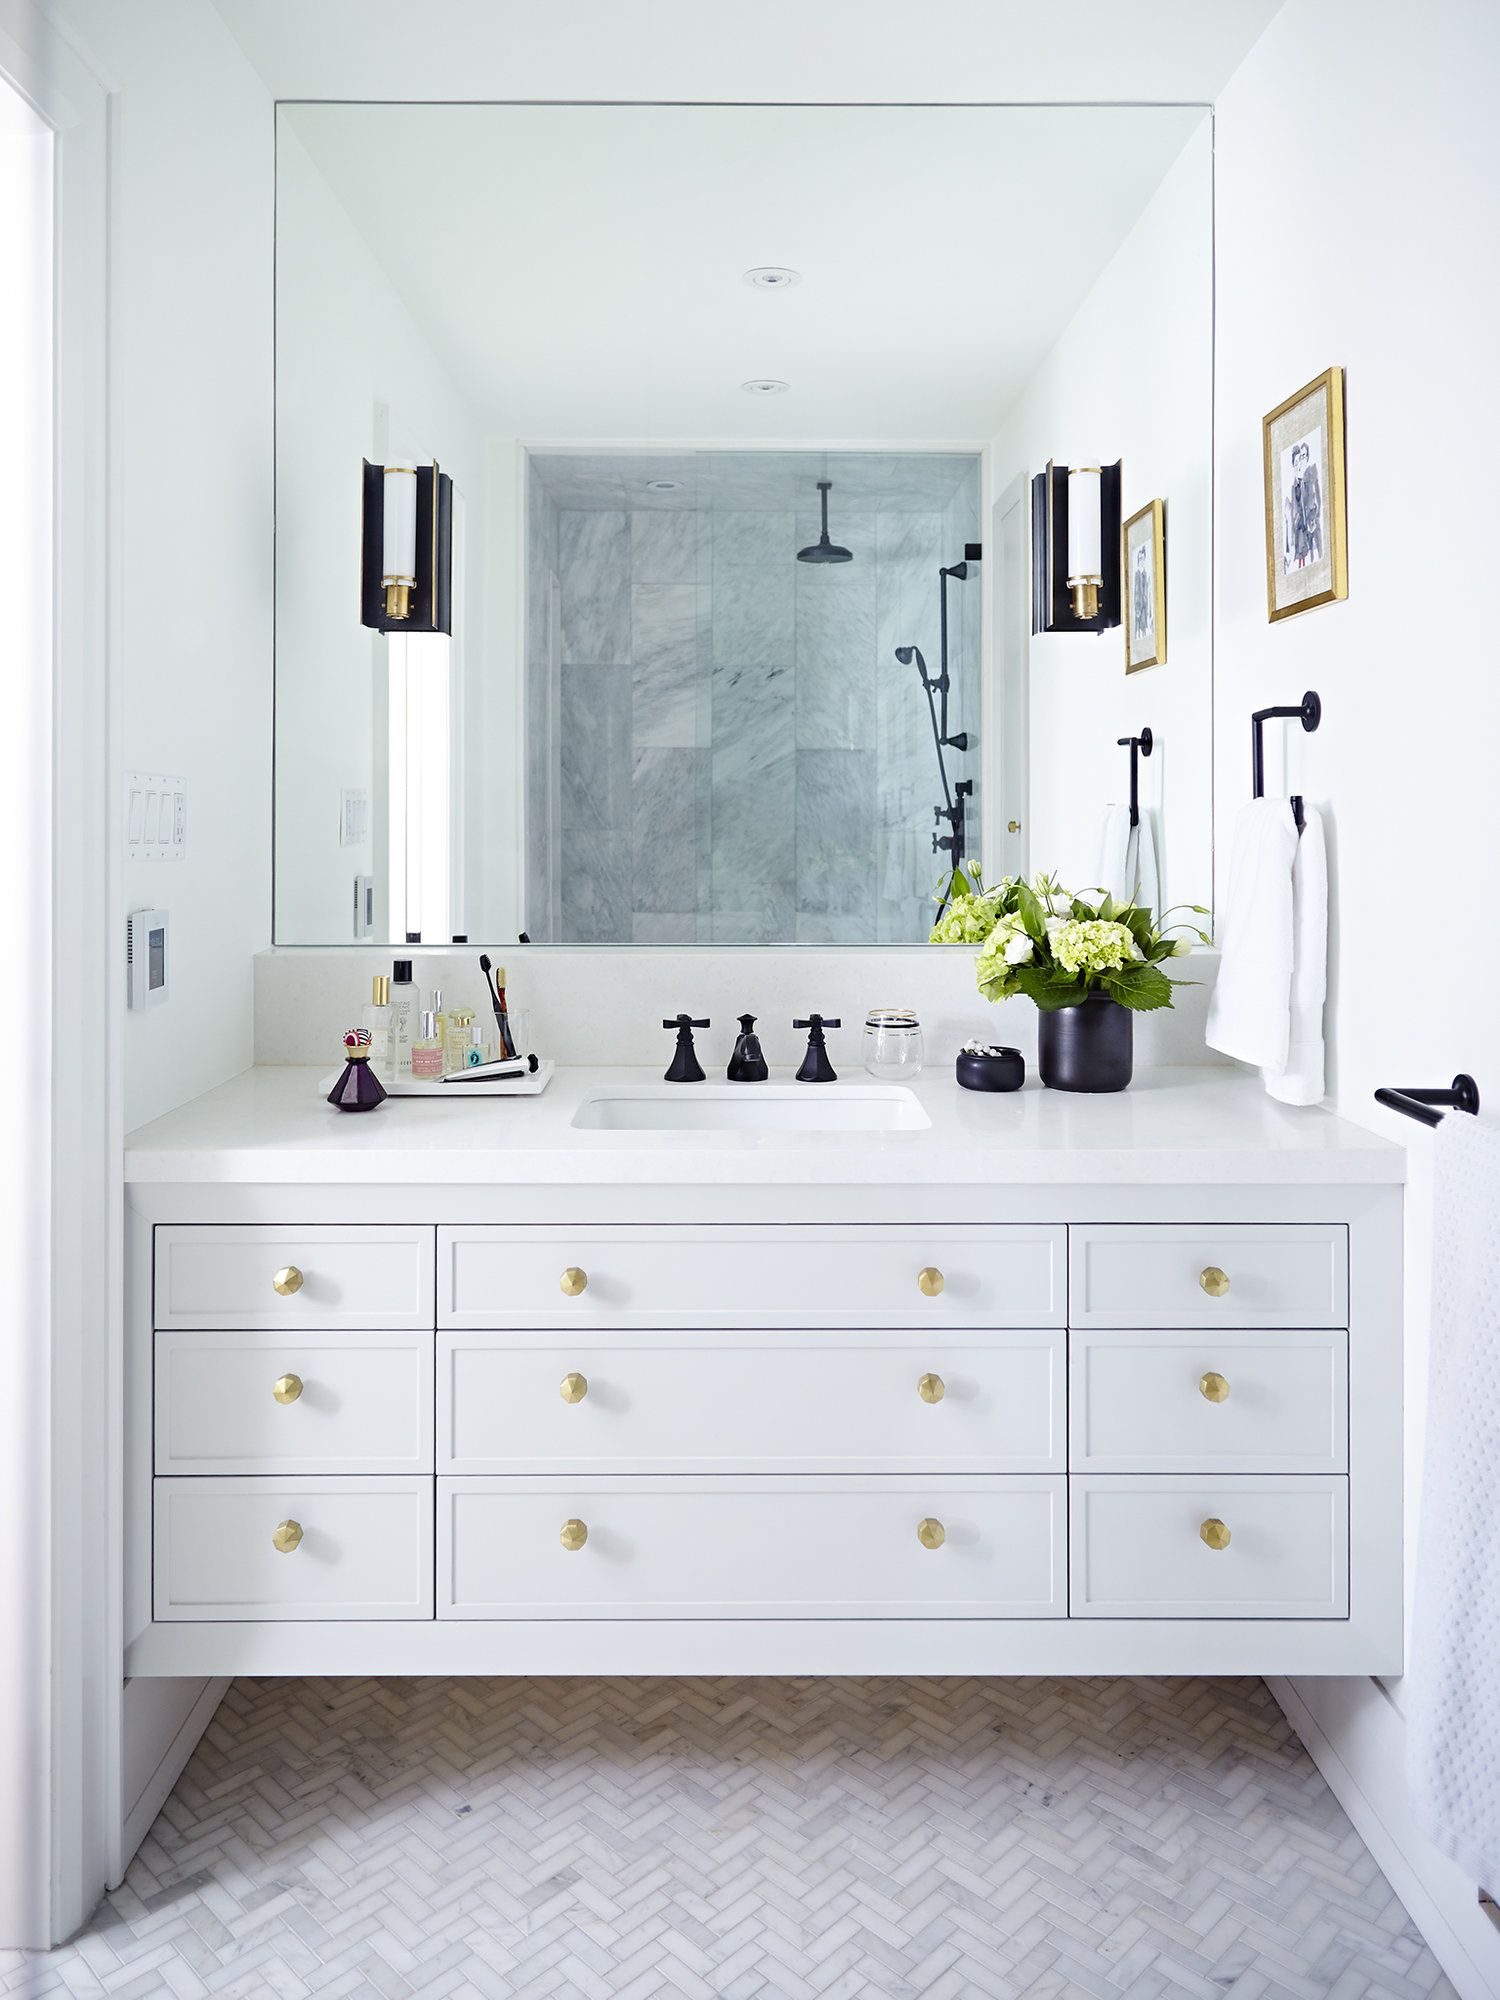 White Modern Bathroom With Brass Hardware Feasby Bleeks